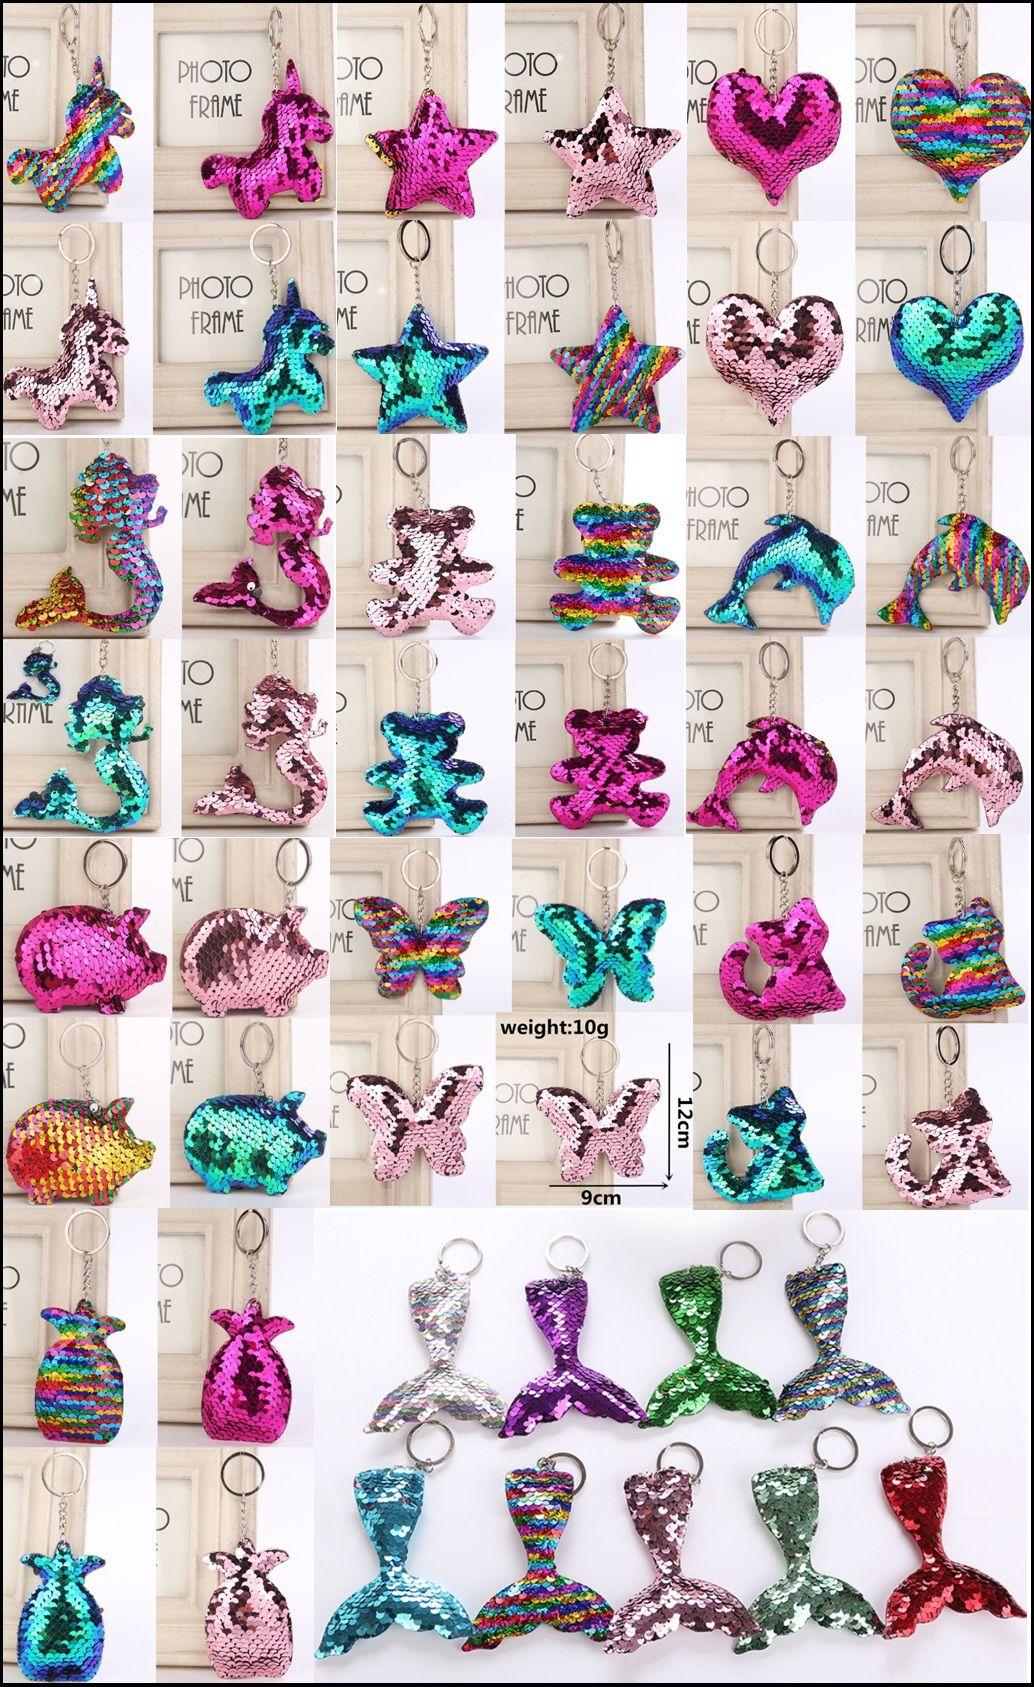 Cute unicorn Keychain Glitter Sequins Key Chain car Bag Key Ring star Keychains mermaid Key Chain stars bear fish tail cat pendant